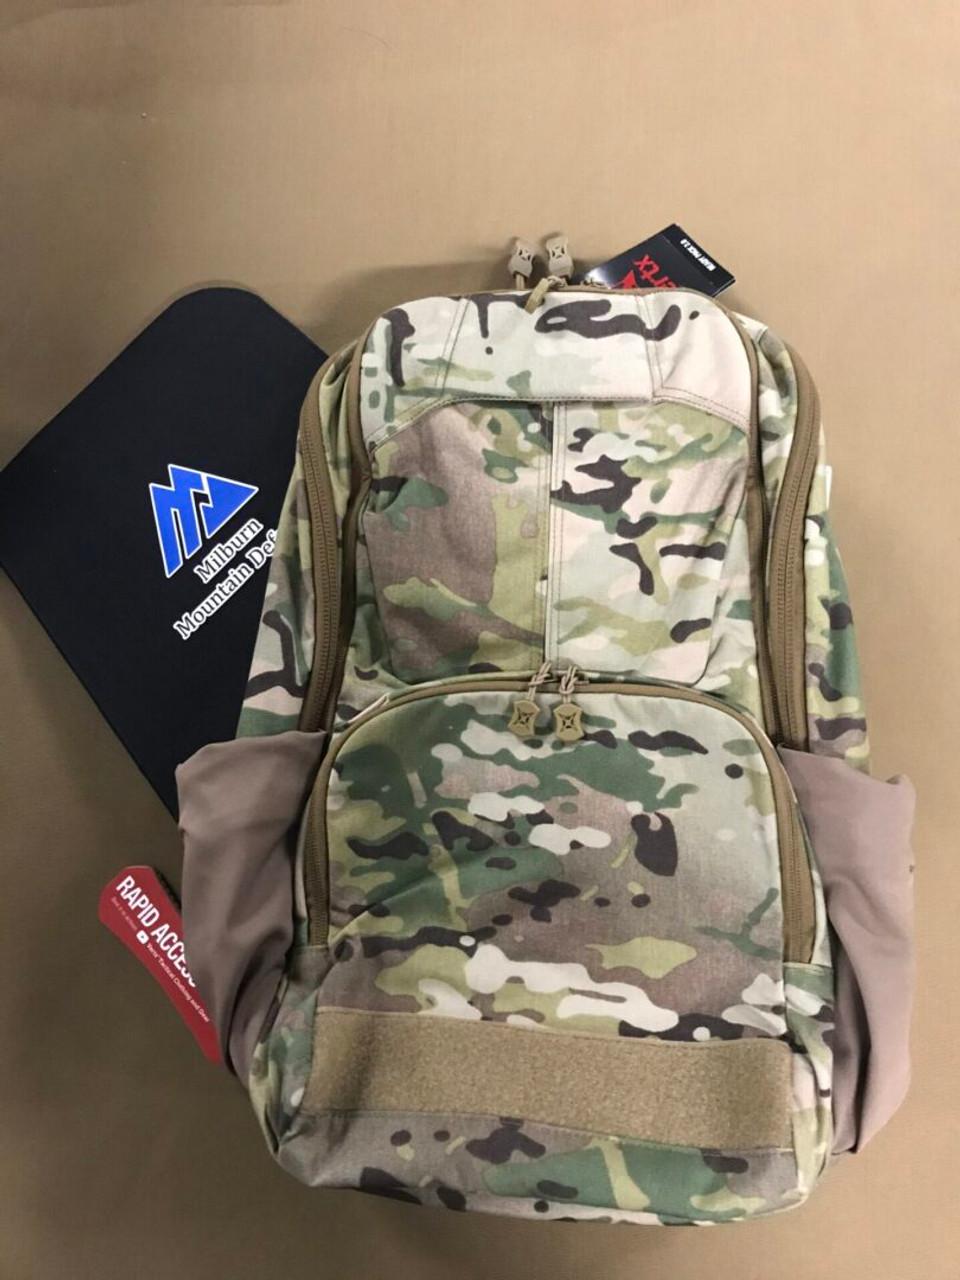 Milburn Mountain Defense IIIA Soft Armour Insert for Vertx Ready Pack 2.0